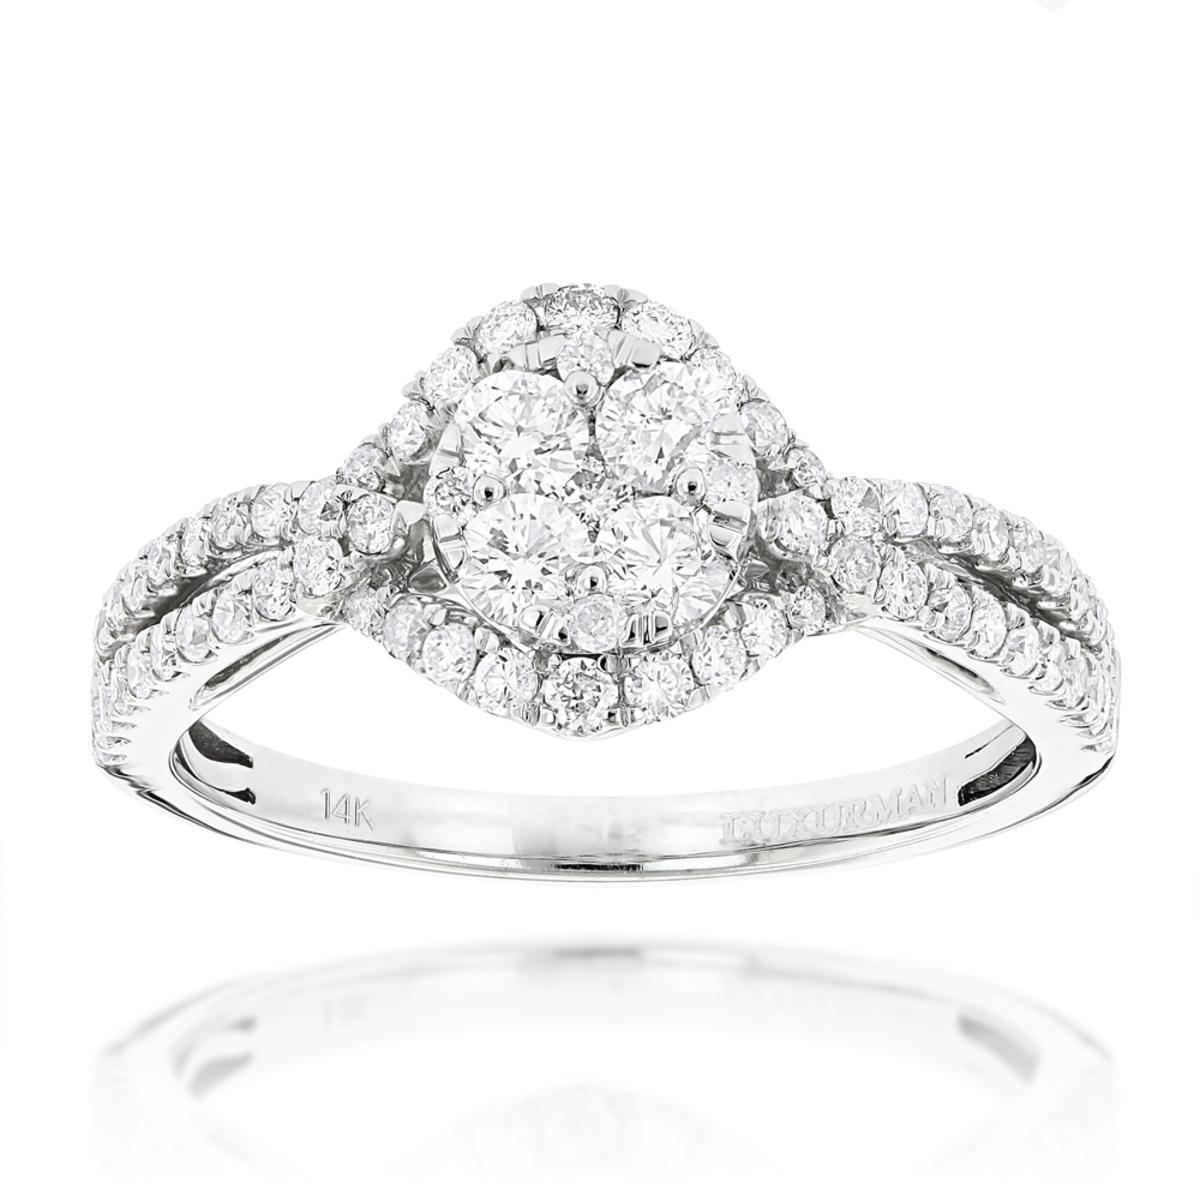 1 Carat Luxurman Ladies Diamond Engagement Ring Cluster Diamonds 14K Gold